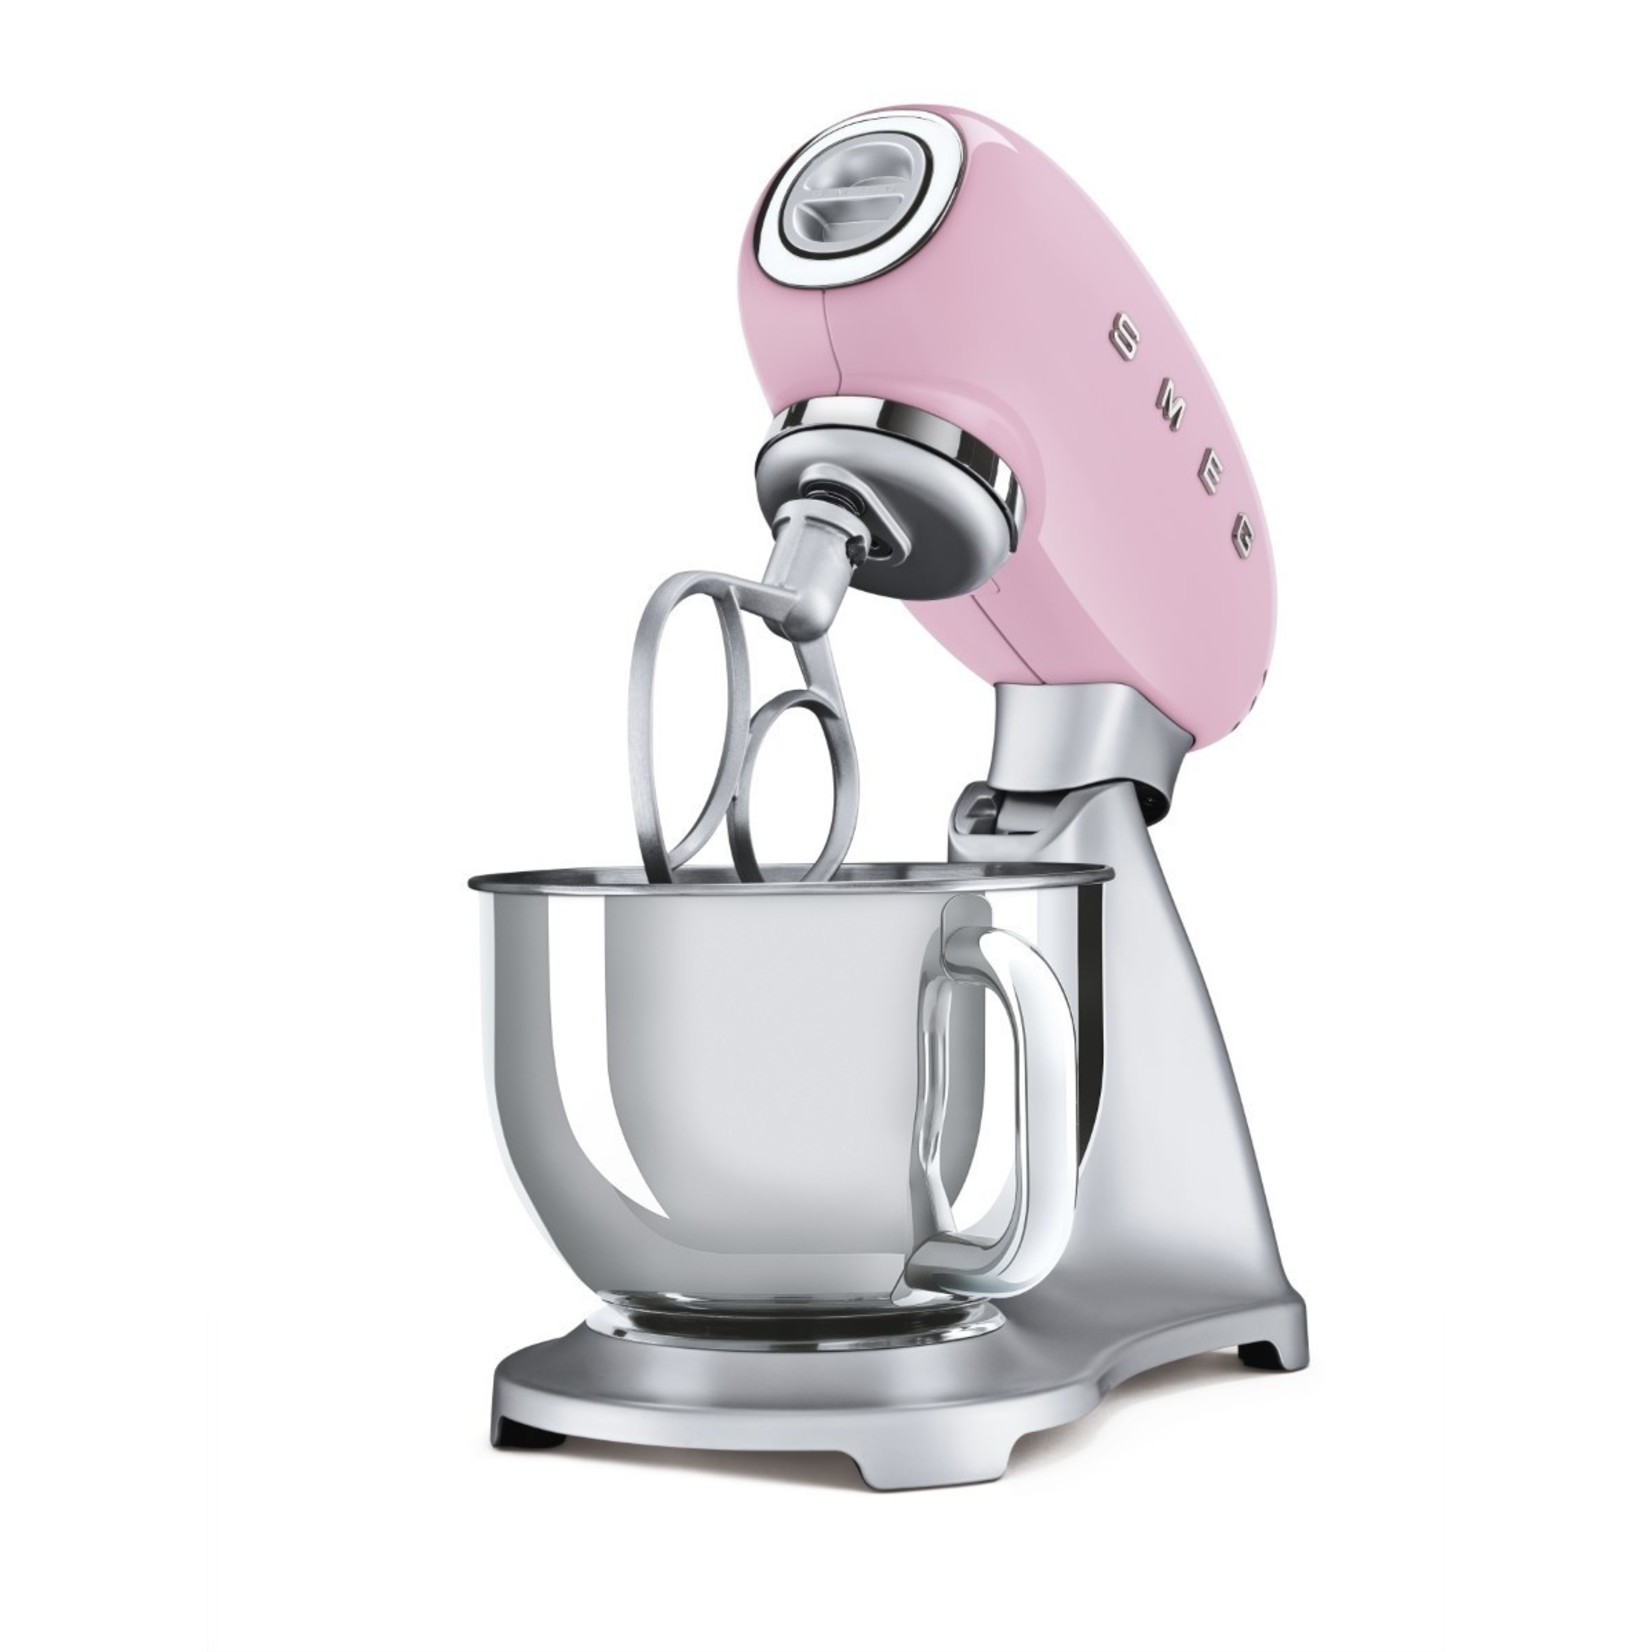 Smeg Smeg Keukenmachine SMF02PKEU, roze